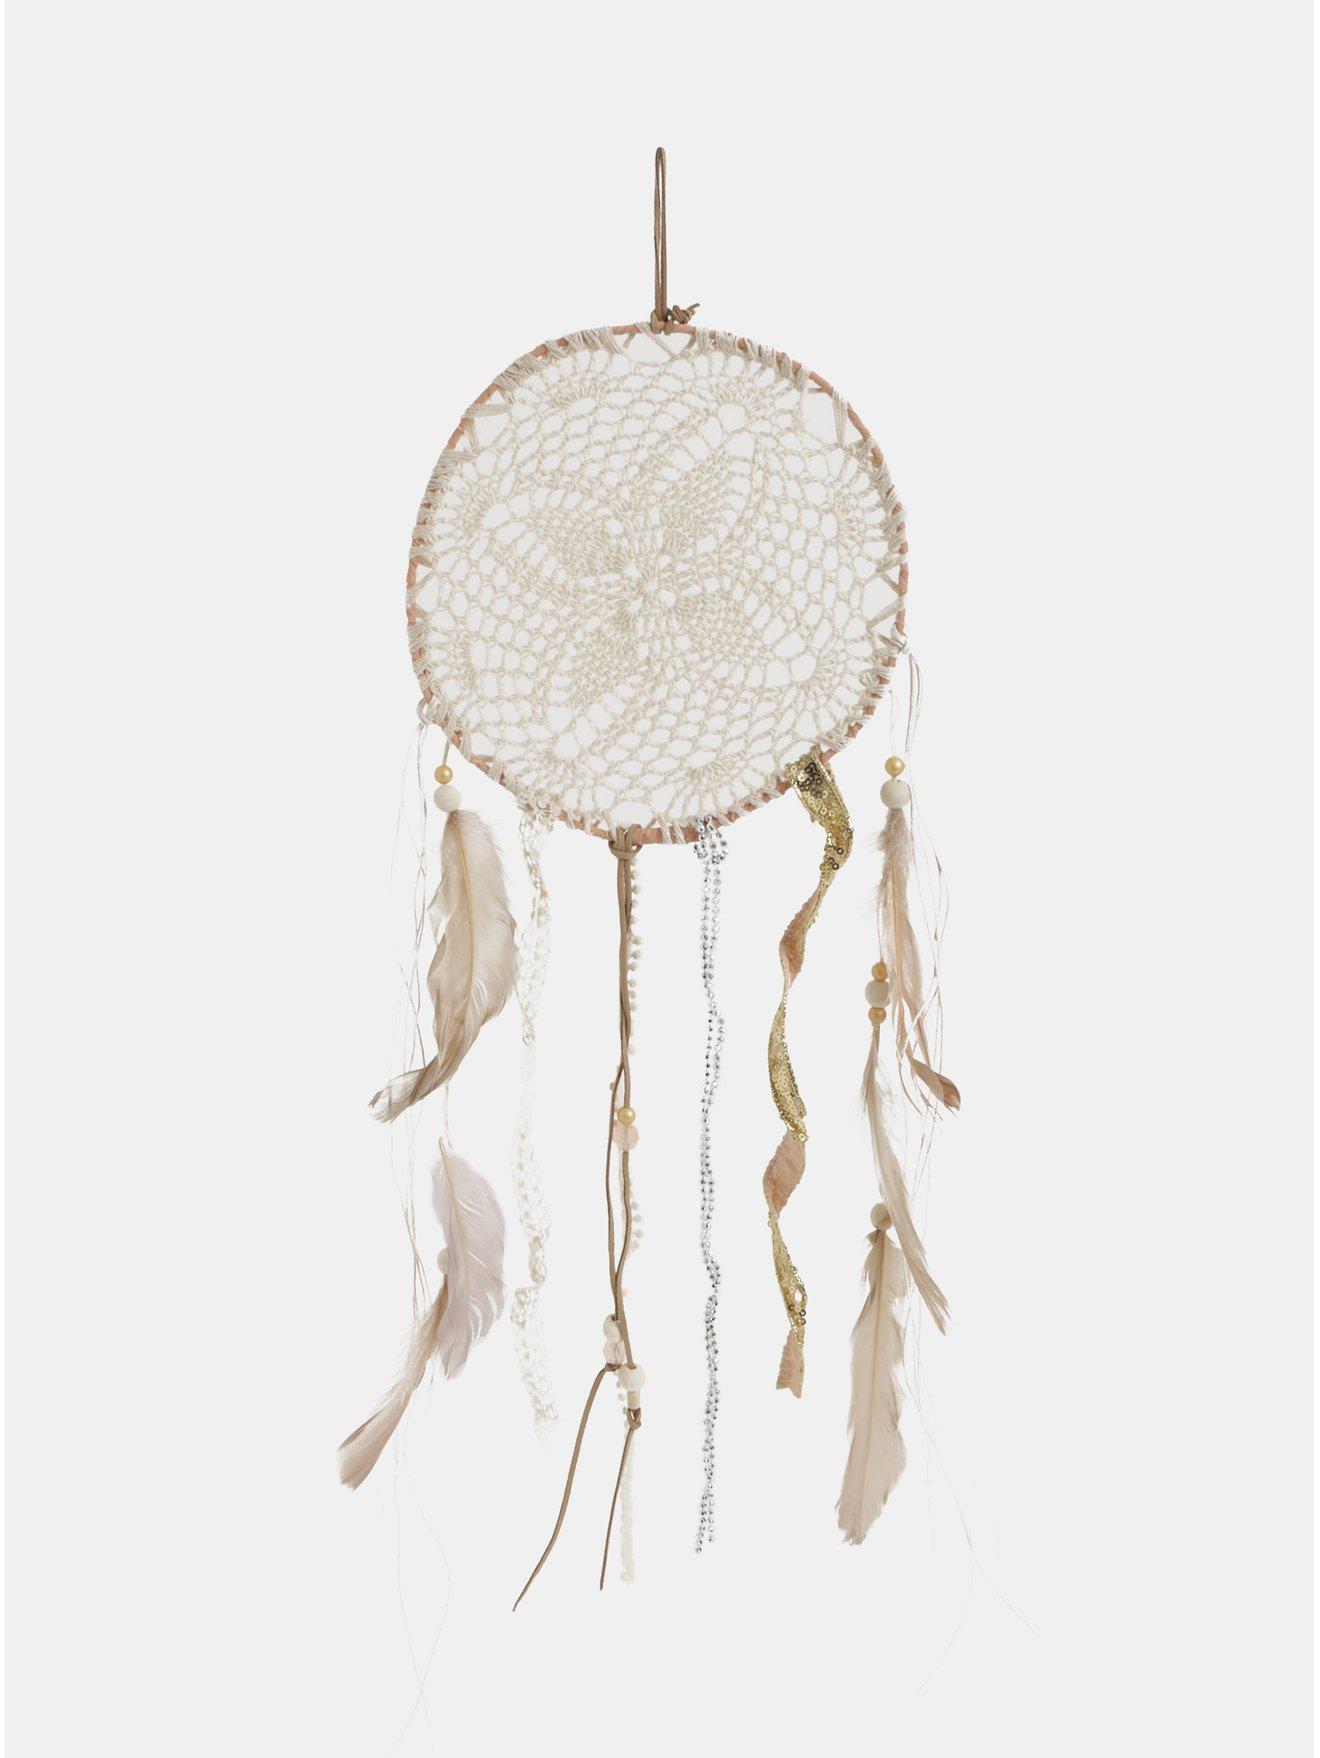 Hnědo-krémový lapač snů s peříčky a flitry Kaemingk